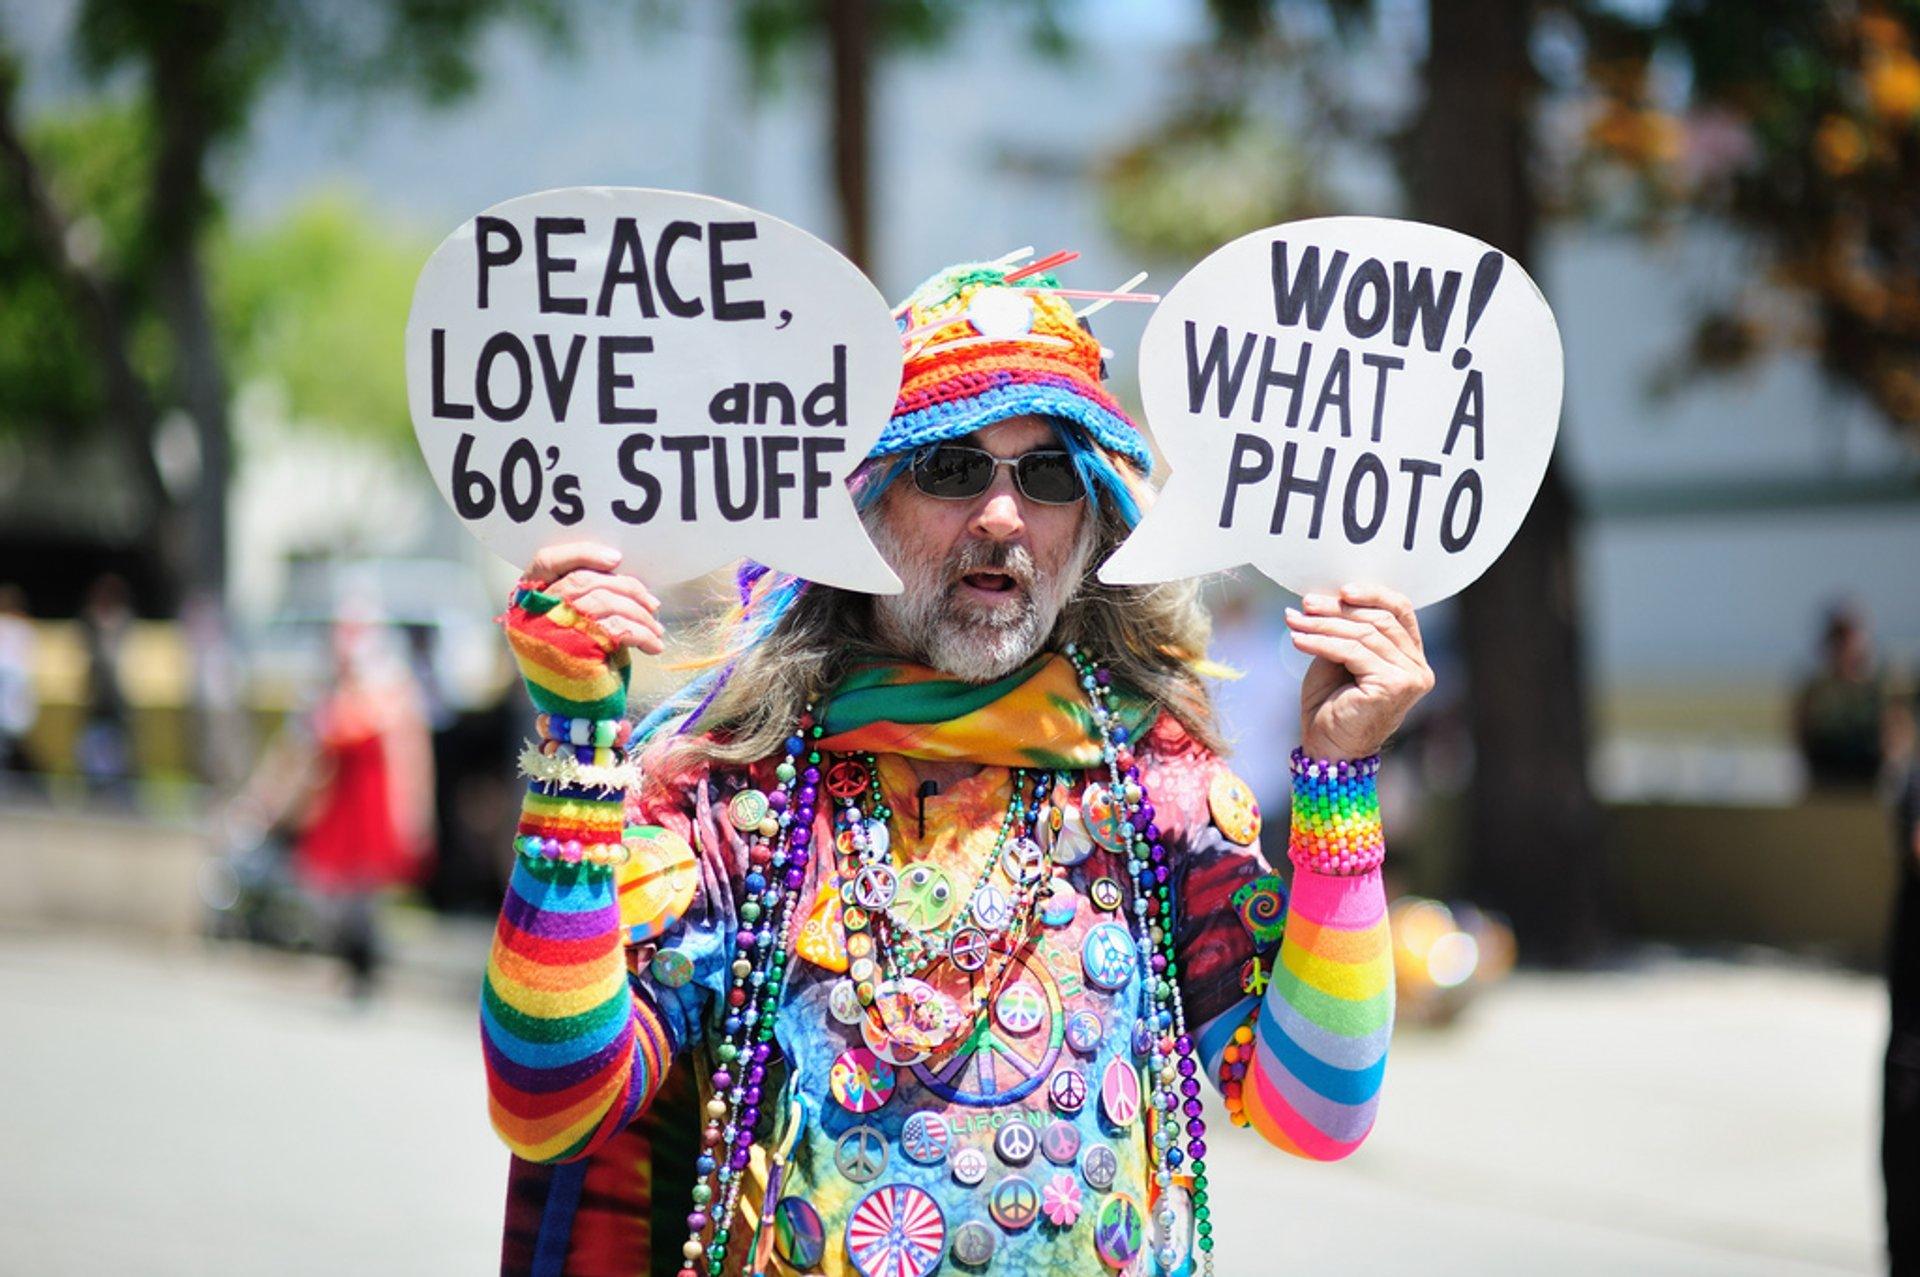 Pasadena Doo Dah Parade in Los Angeles 2020 - Best Time